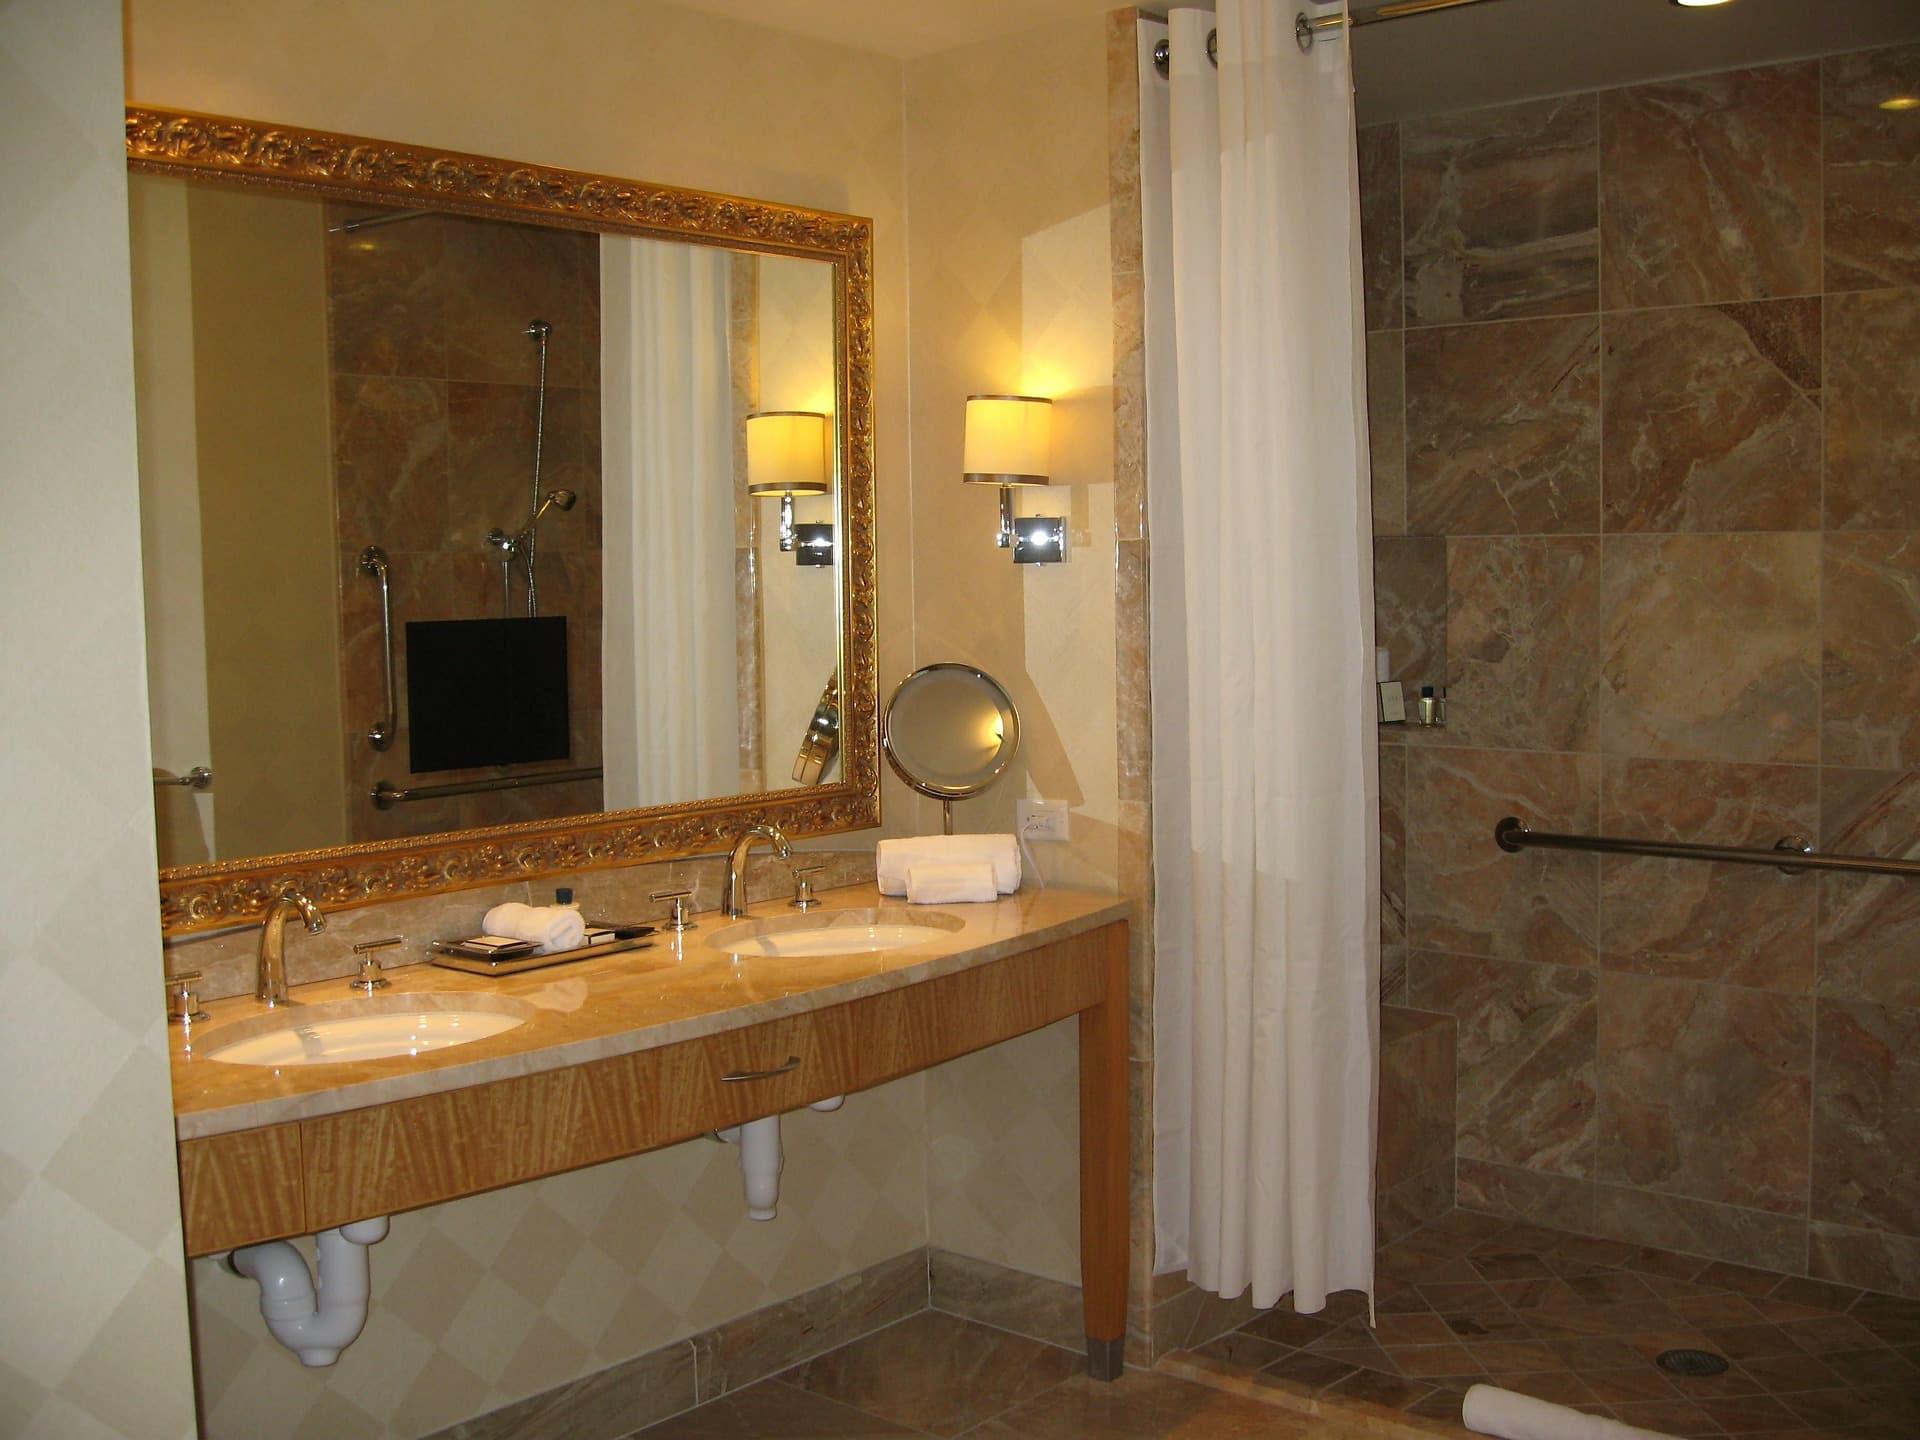 Shower Curtains - Bathroom Accessories